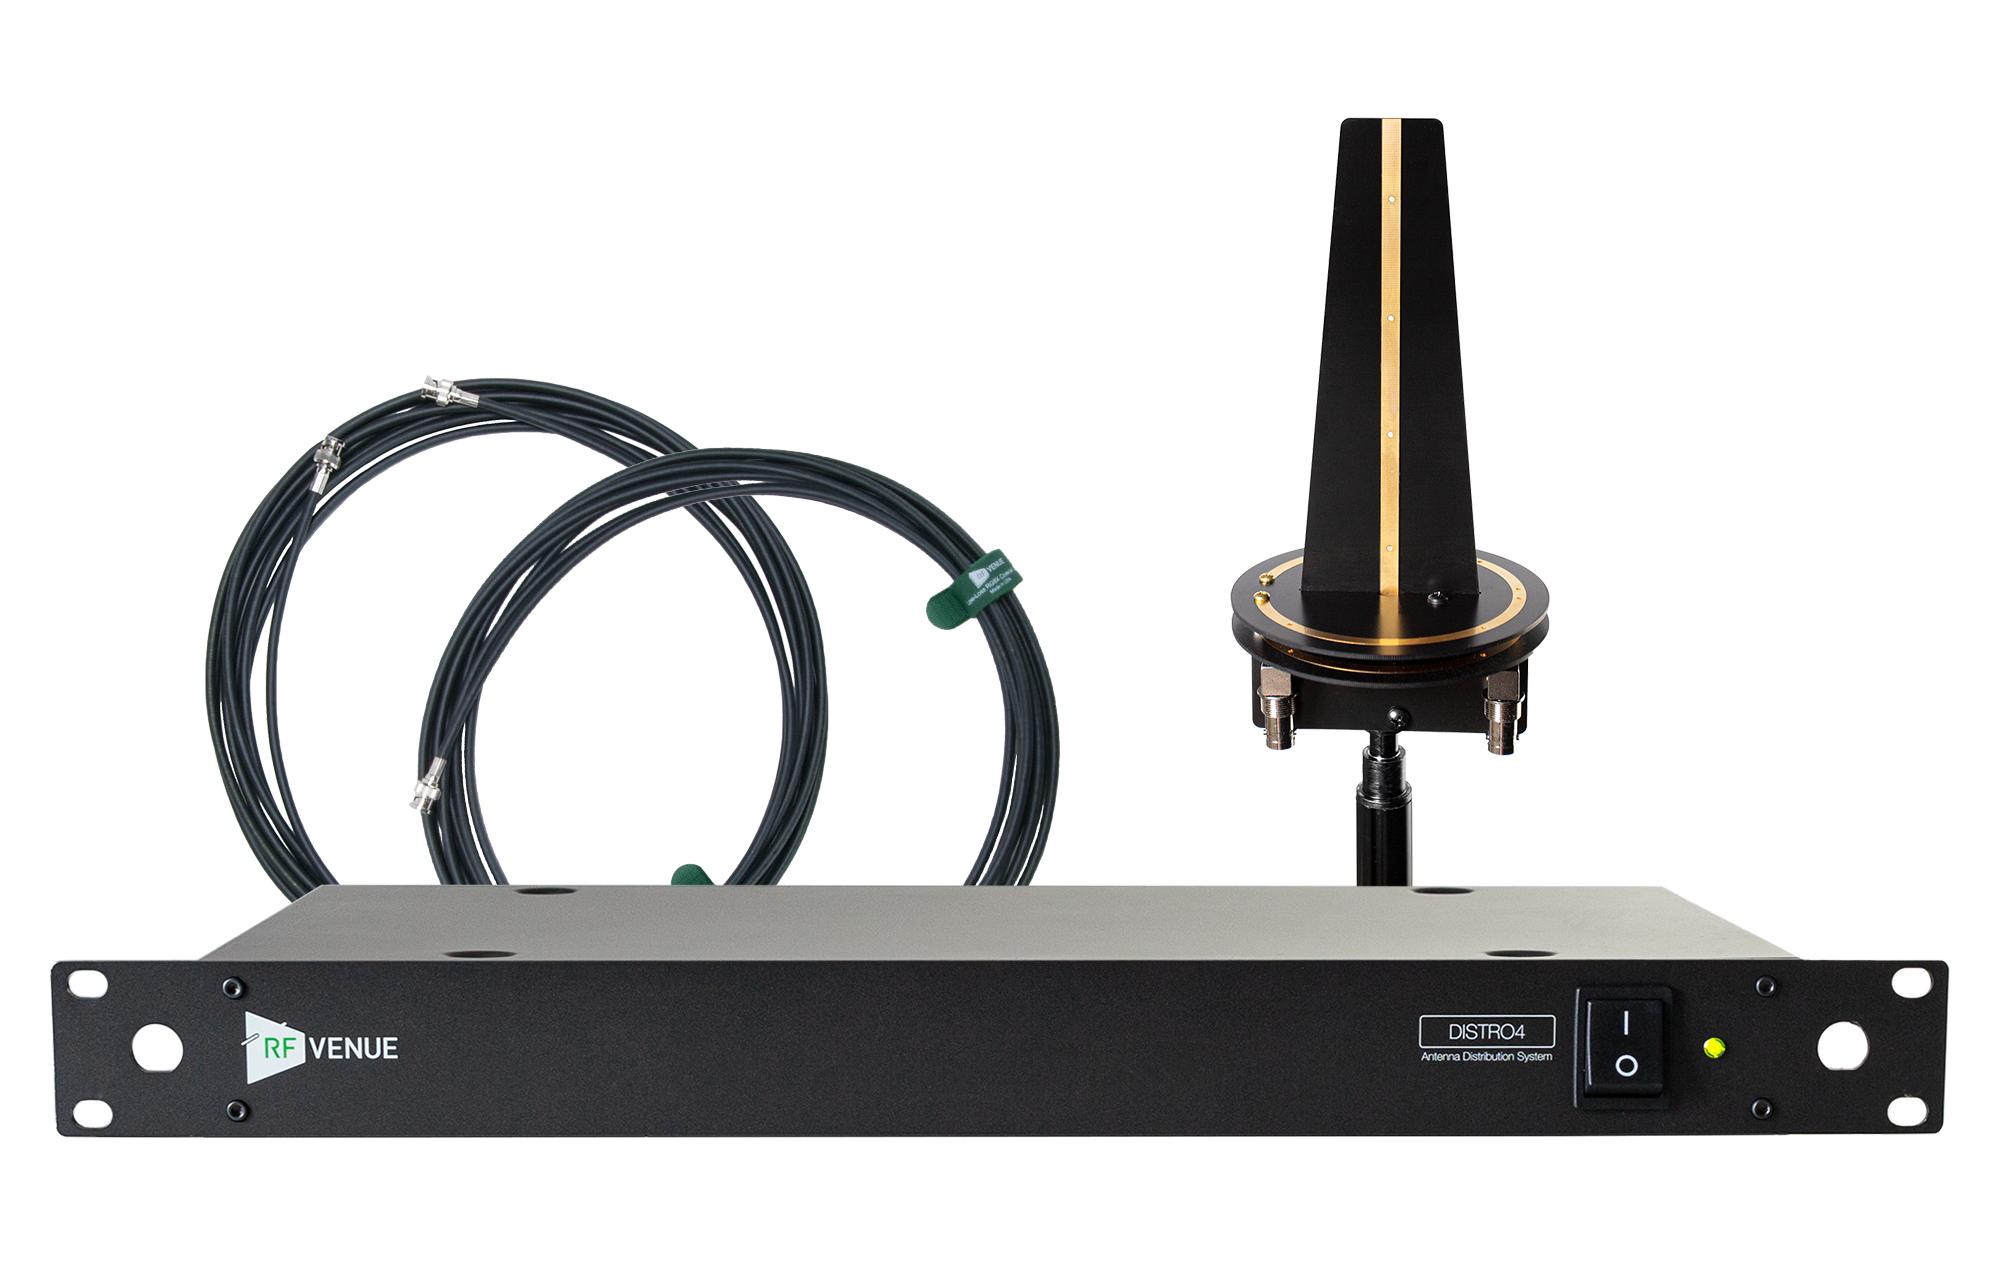 RF Venue 4 Channel Wireless Microphone Omni Upgrade Pack